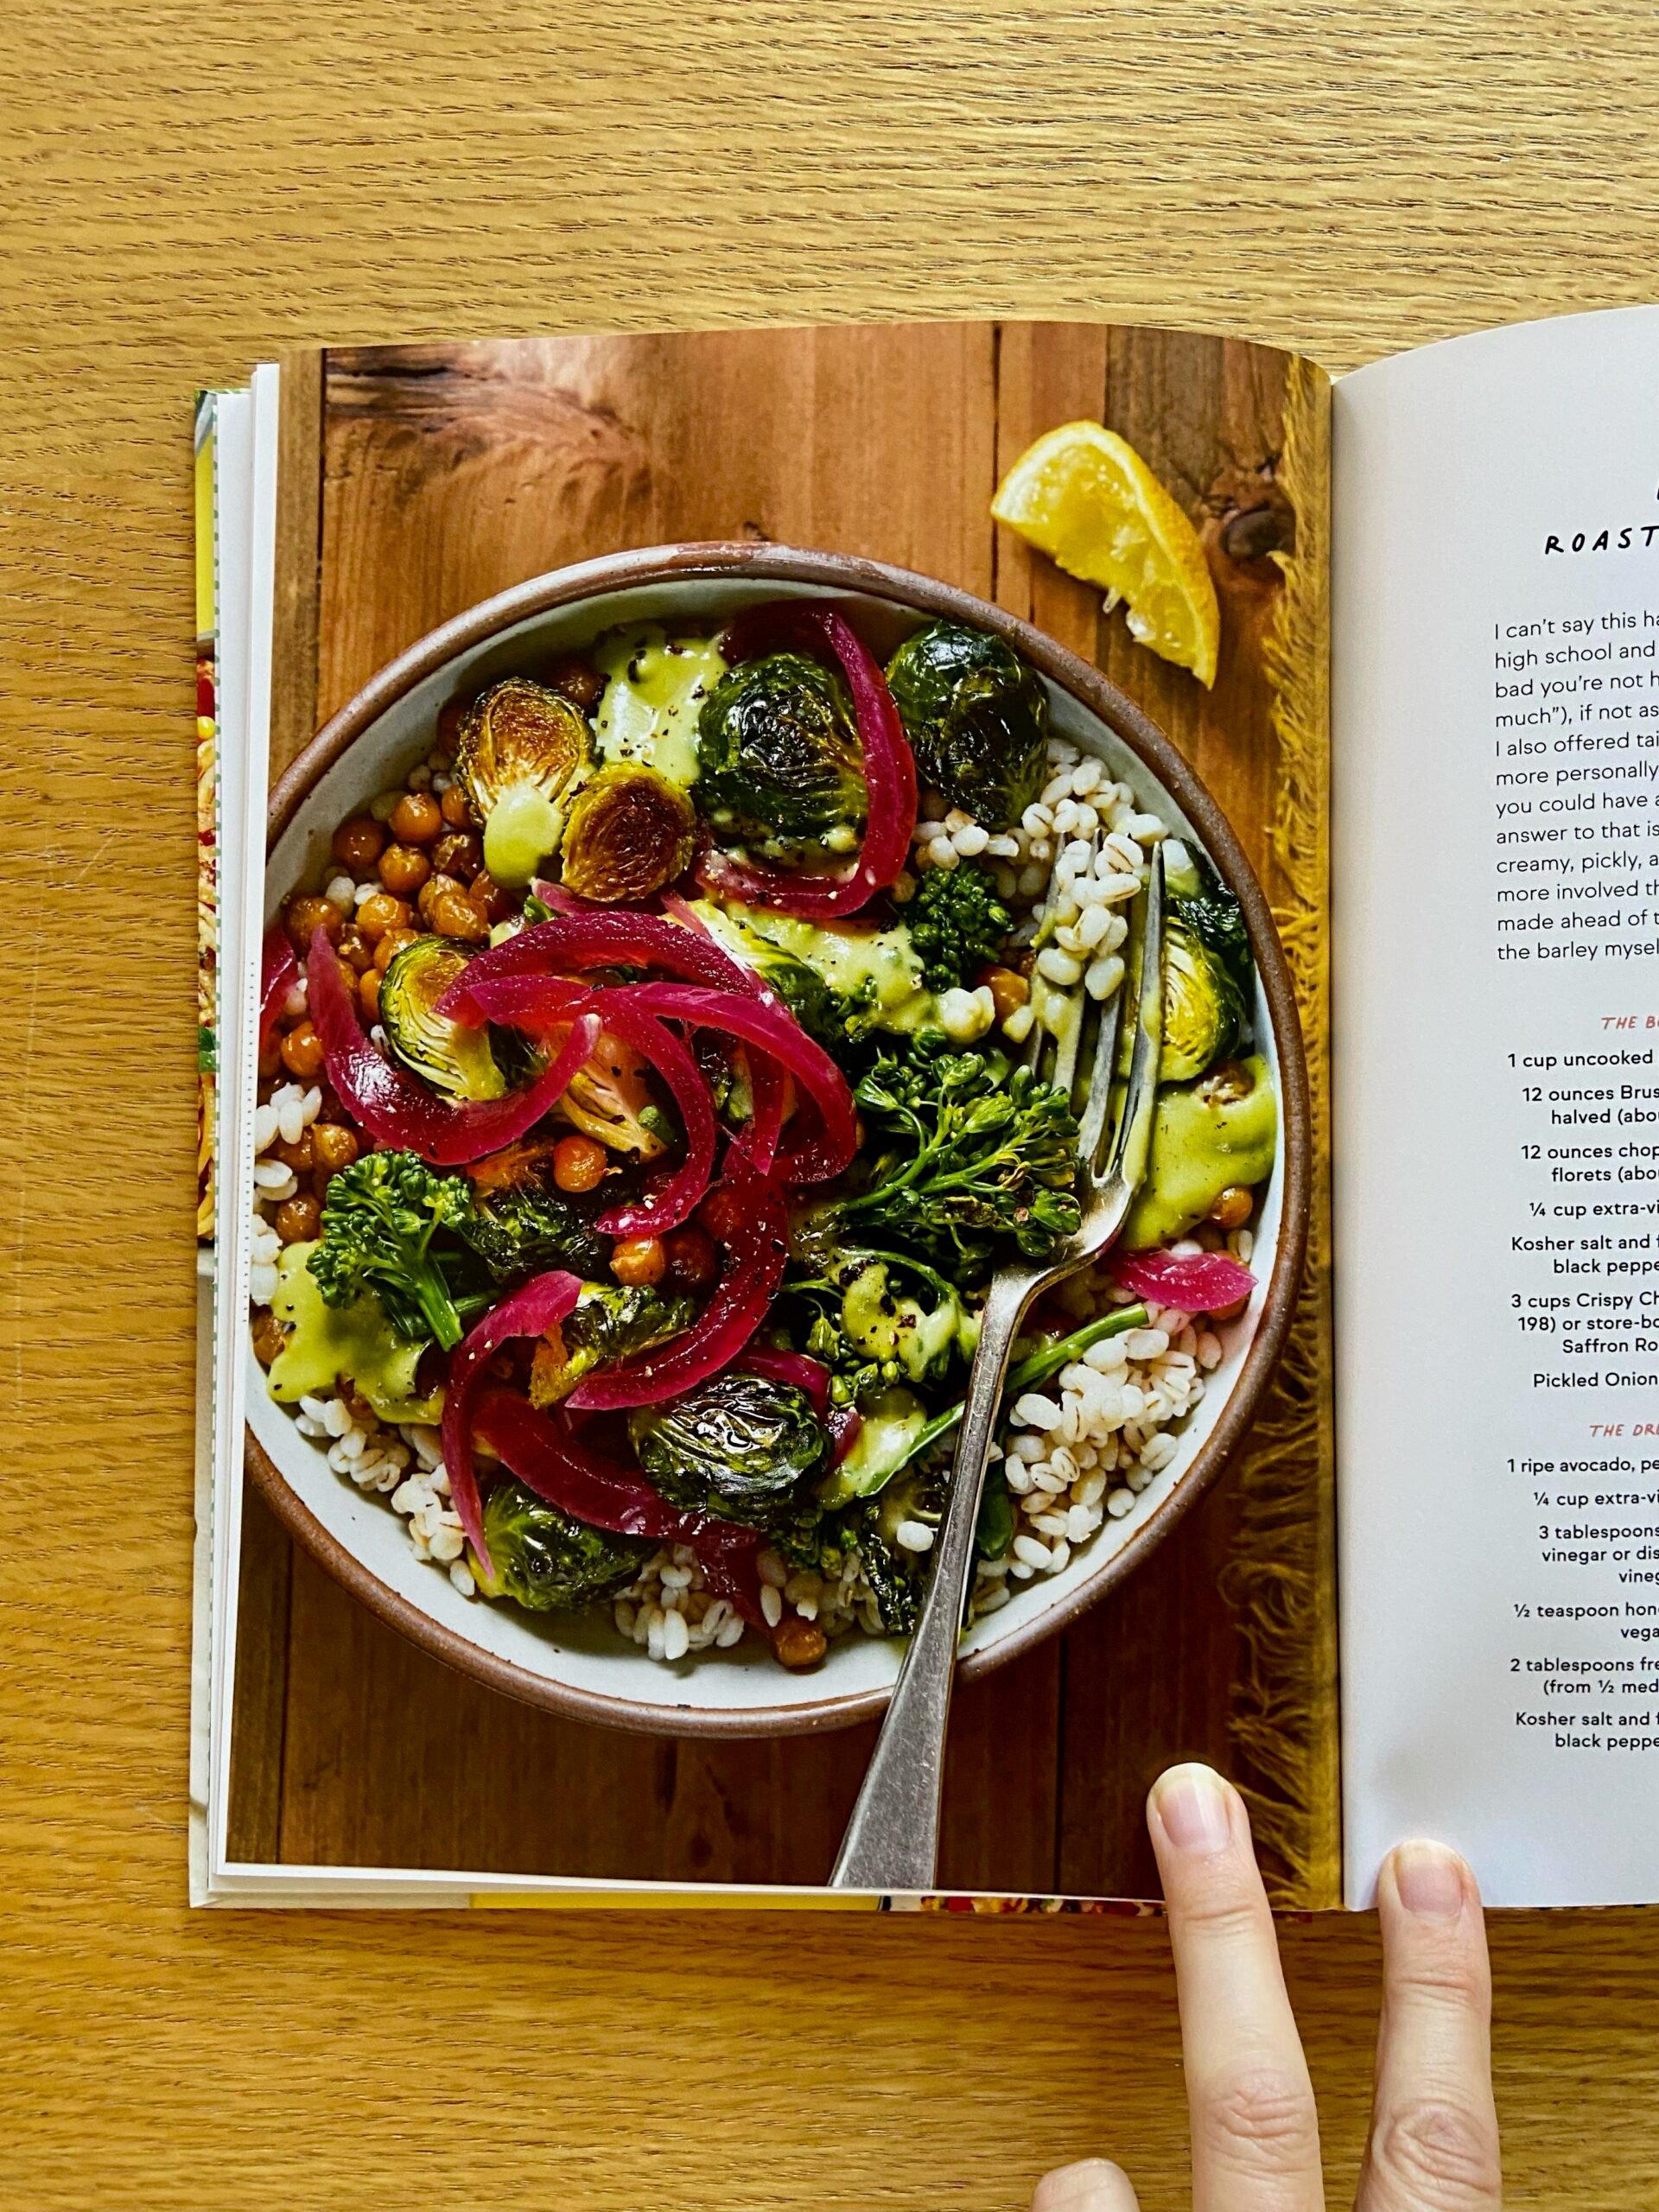 Jenny Rosenstrach's the weekday vegetarians cookbook